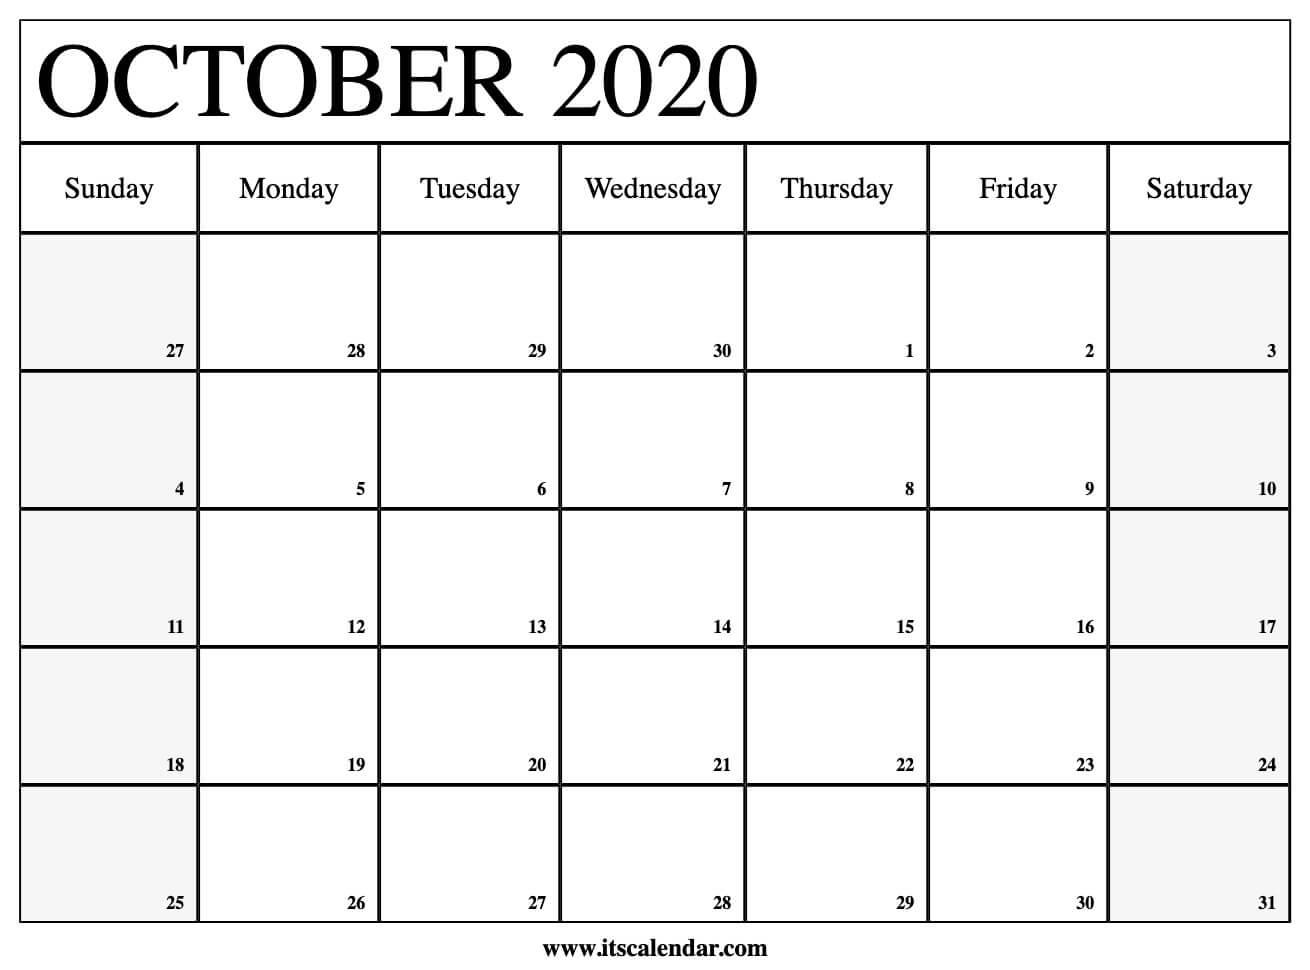 Free Printable October 2020 Calendar regarding Printable Calendar Date Range